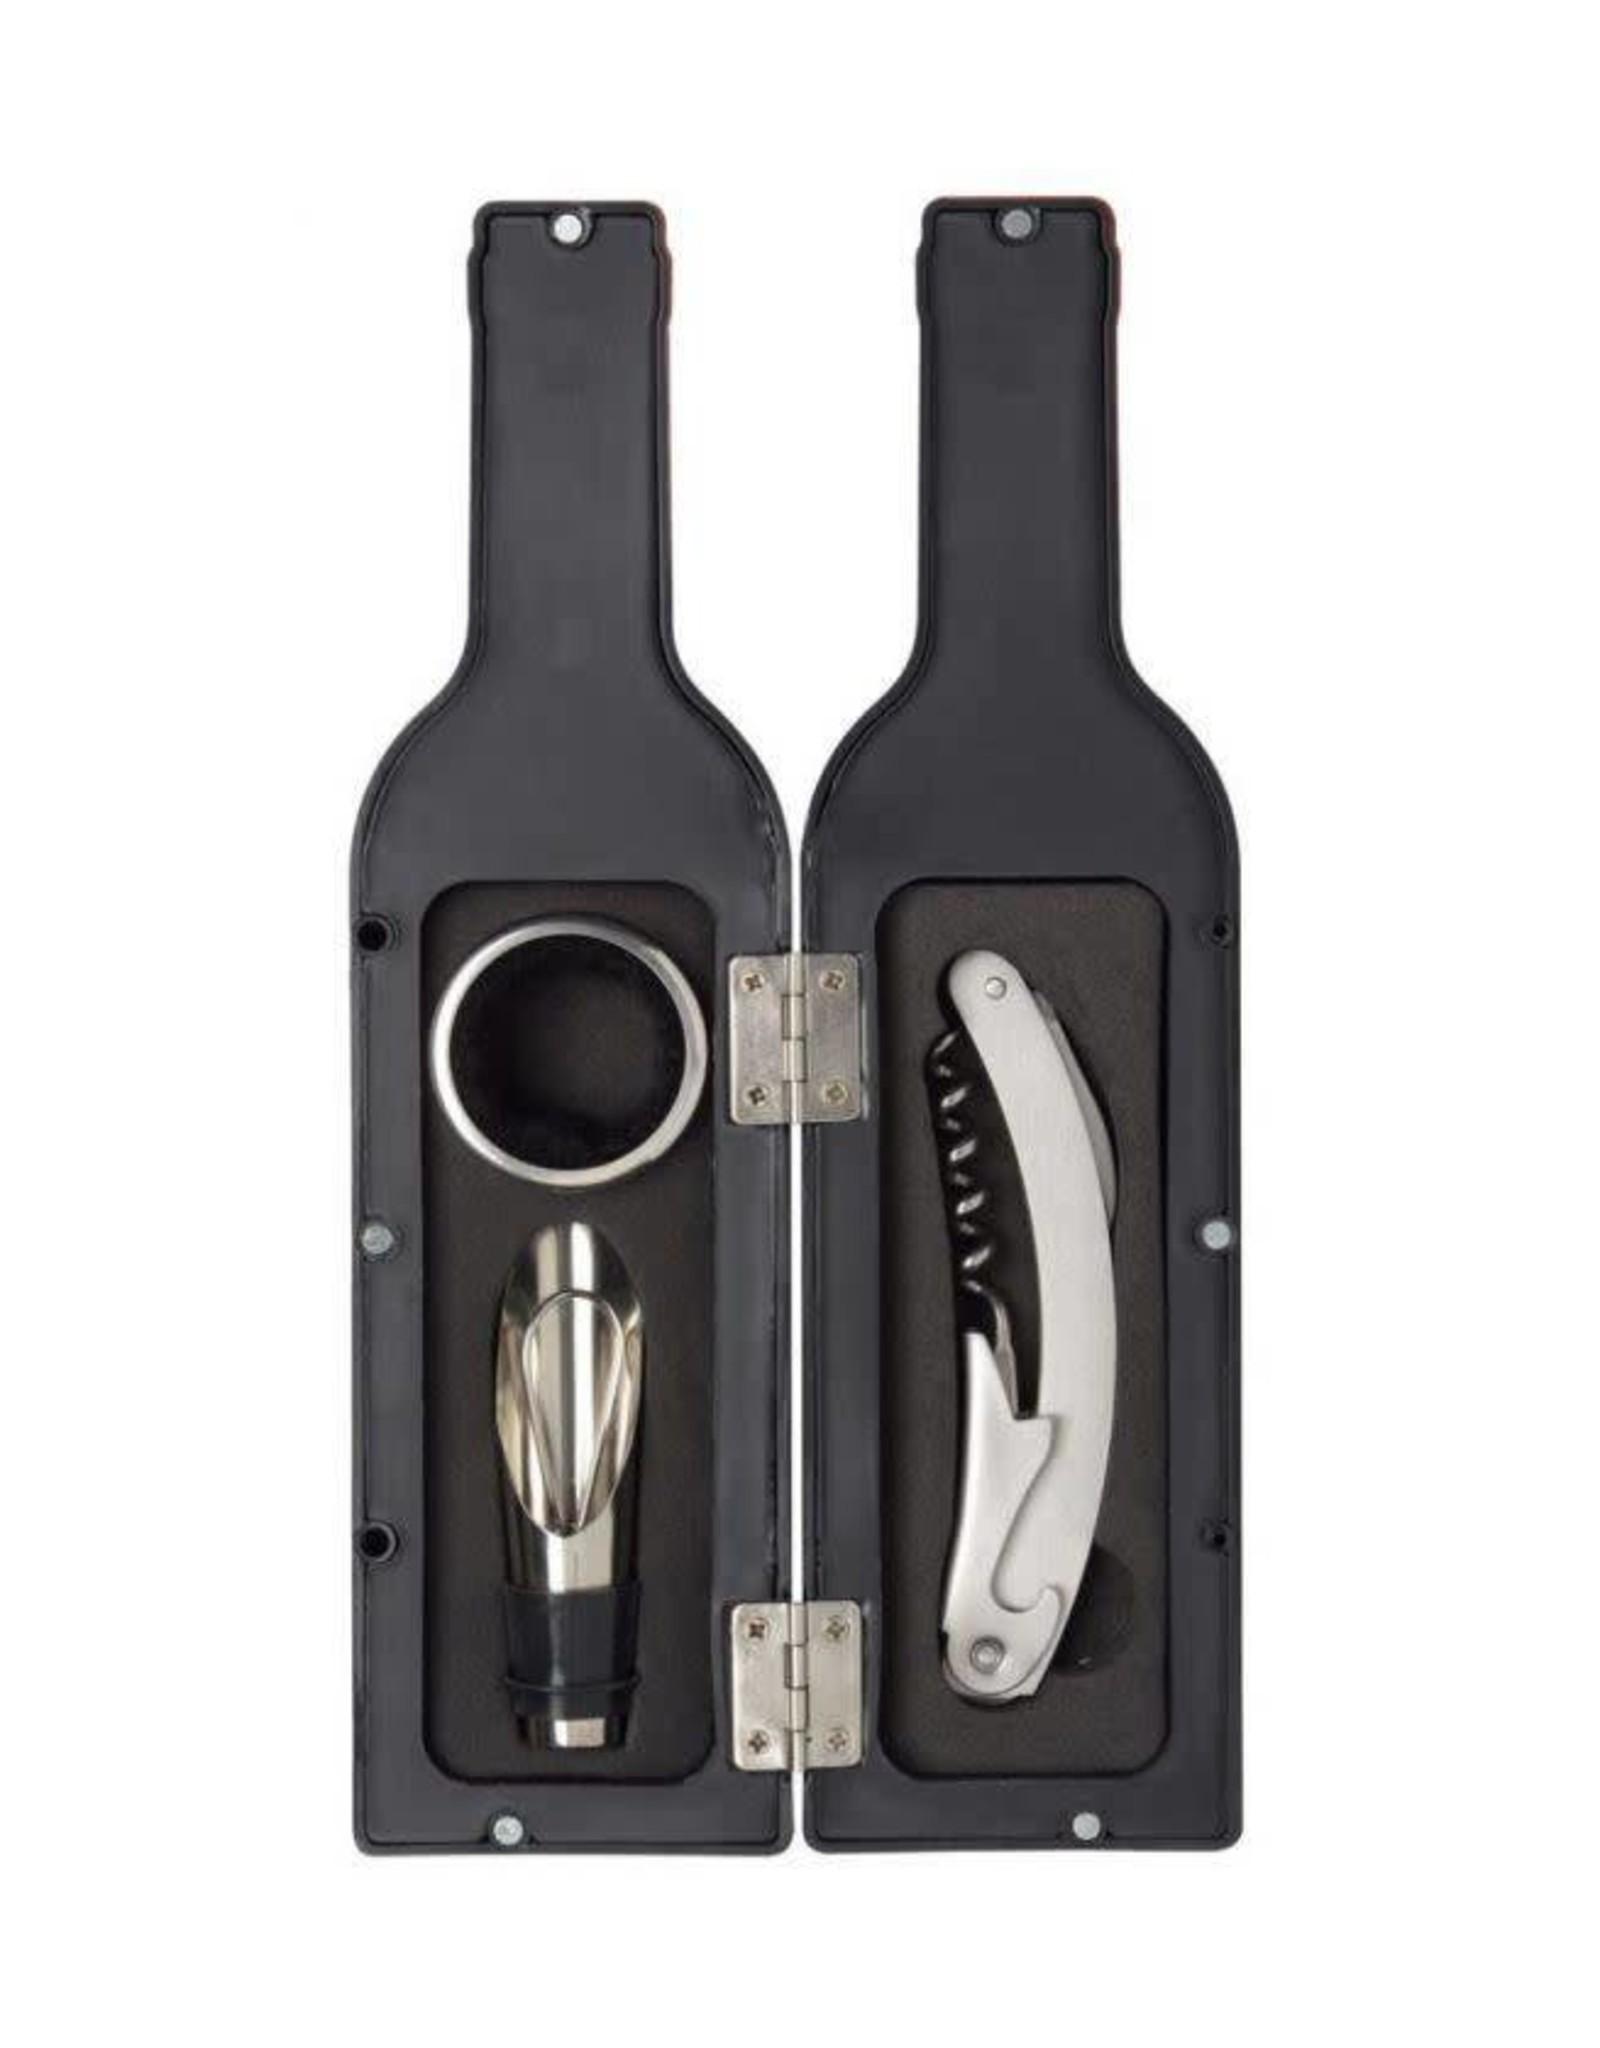 wine kit in the shape of a wine bottle (small)